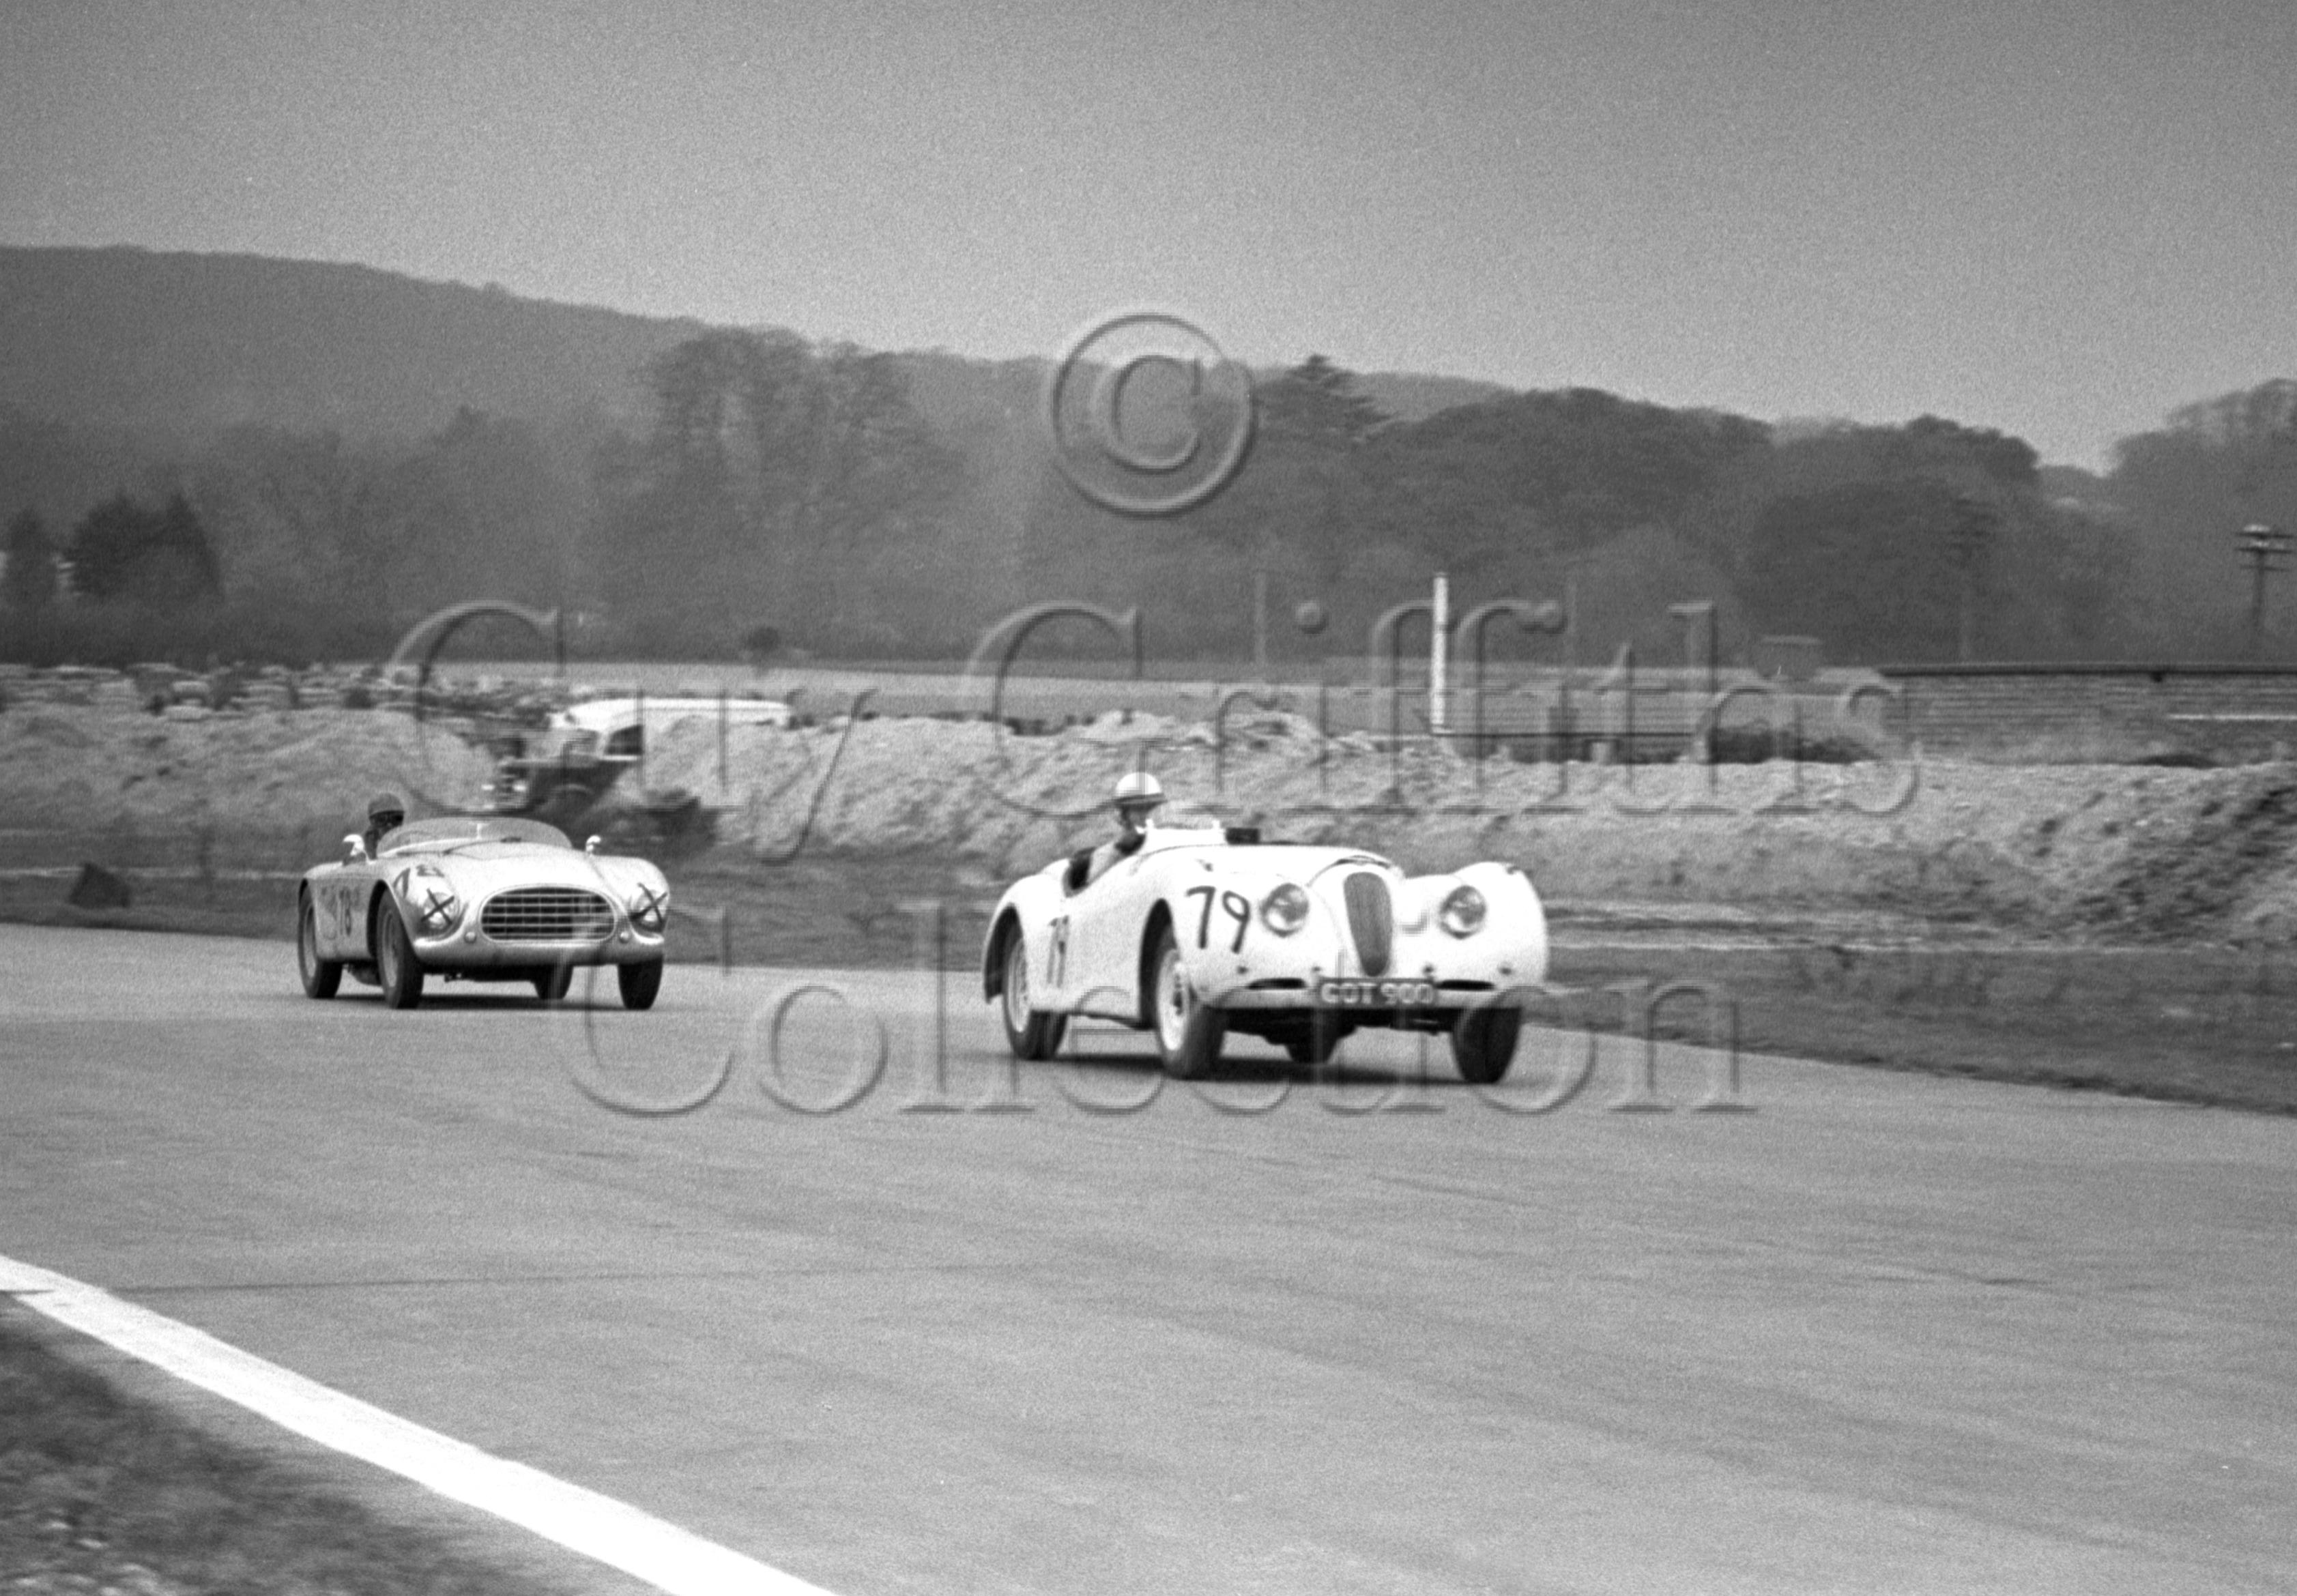 66-674–M-Head–Jaguar–Goodwood–06-04-1953.jpg - Guy Griffiths Collection